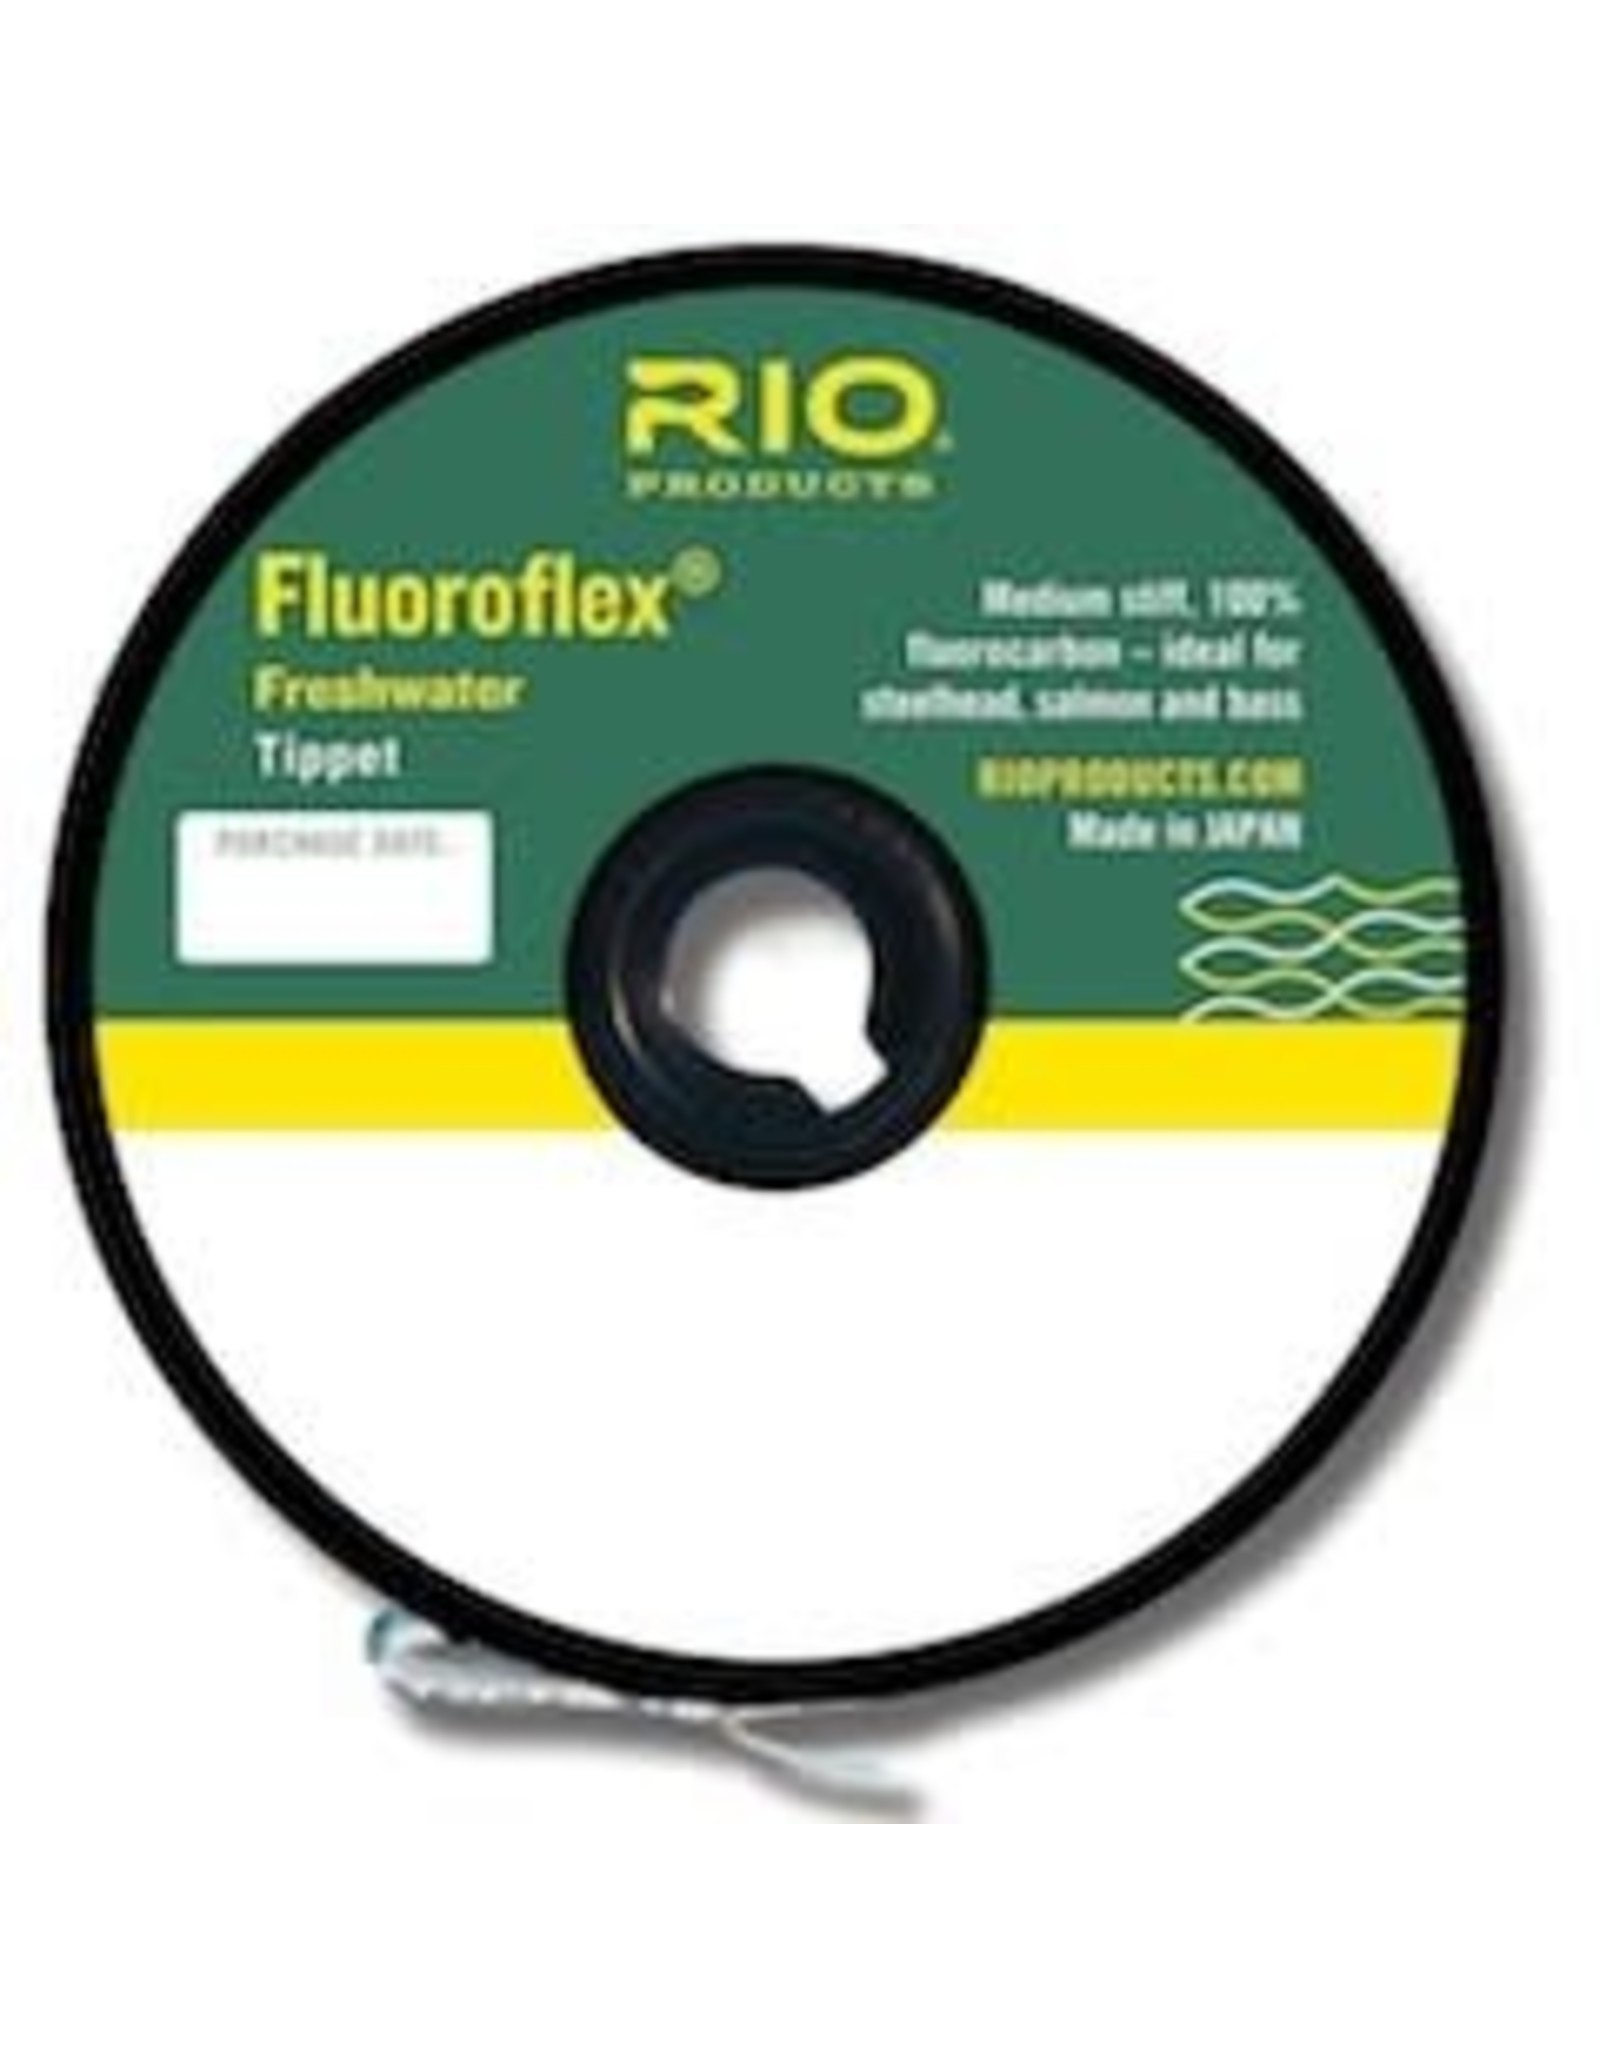 RIO RIO FLUOROFLEX FRESHWATER TIPPET 30yd